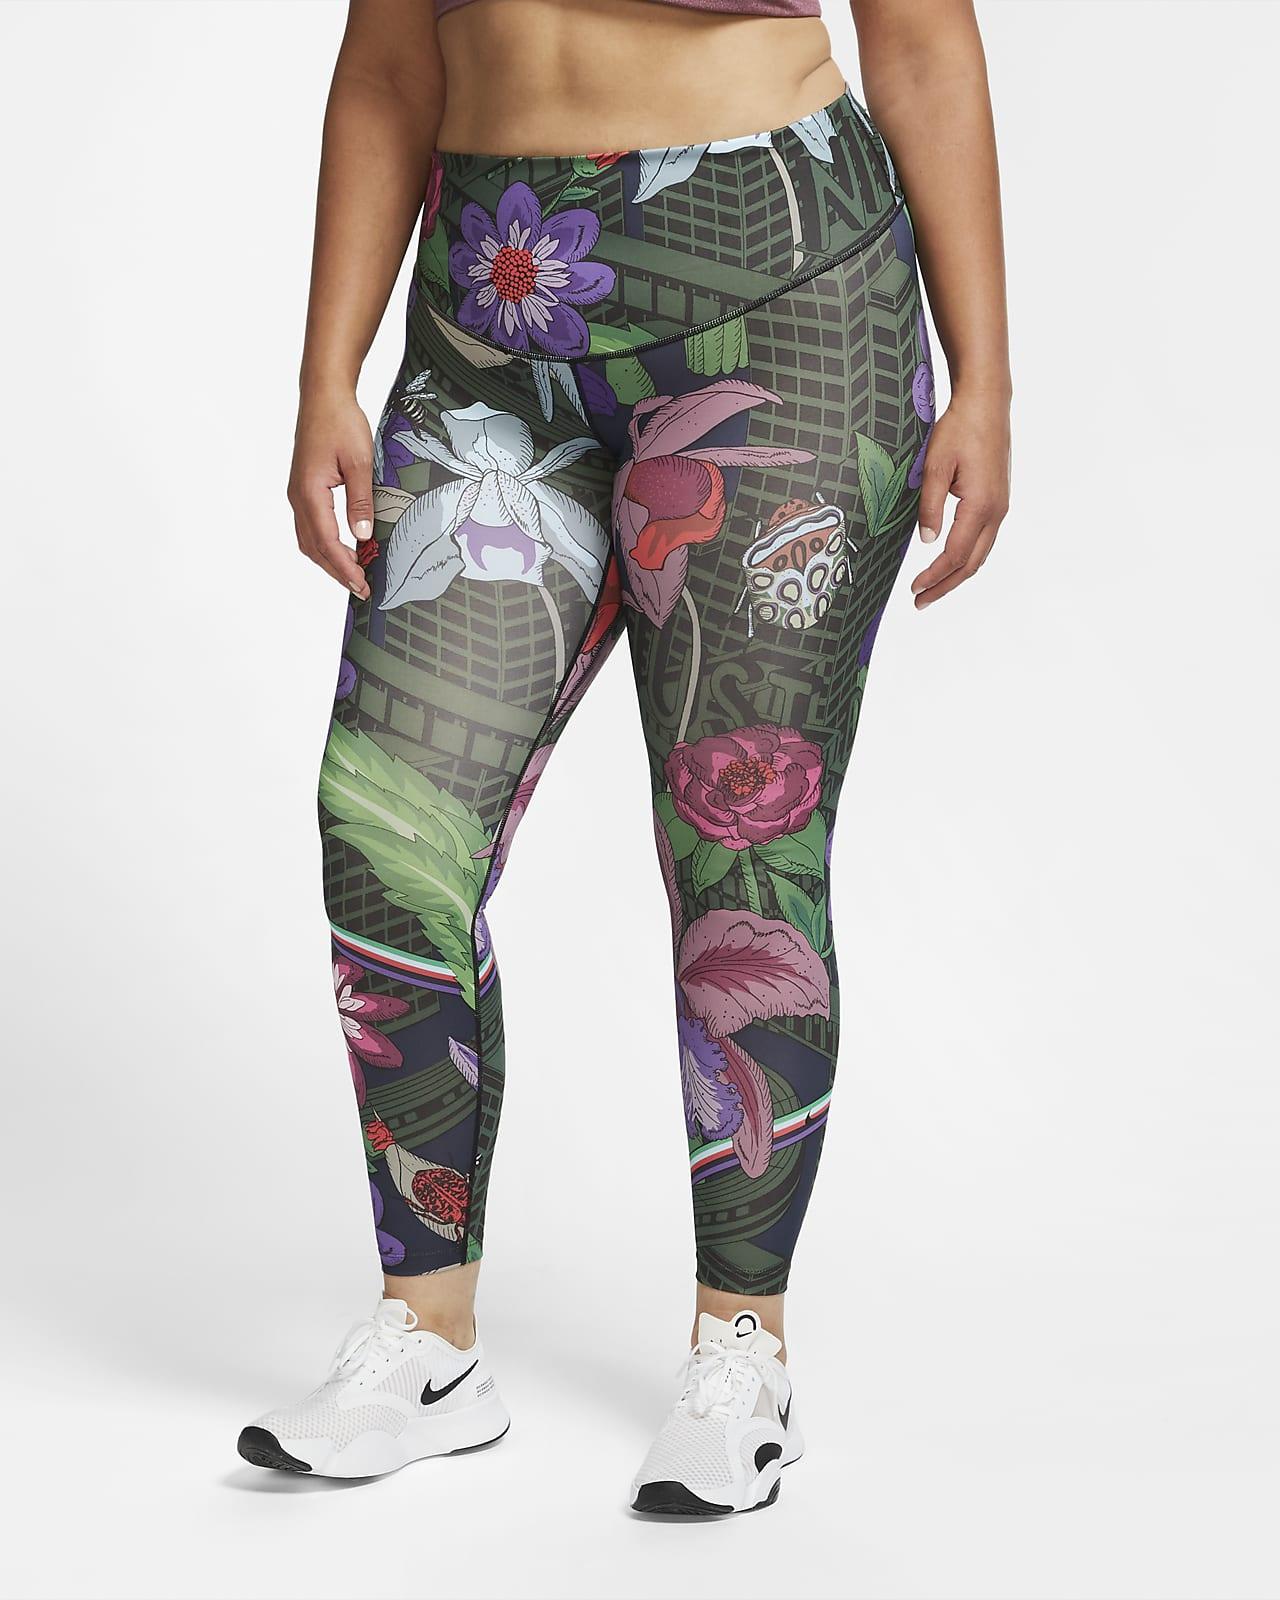 Nike One Icon Clash Women's Printed Leggings (Plus size)